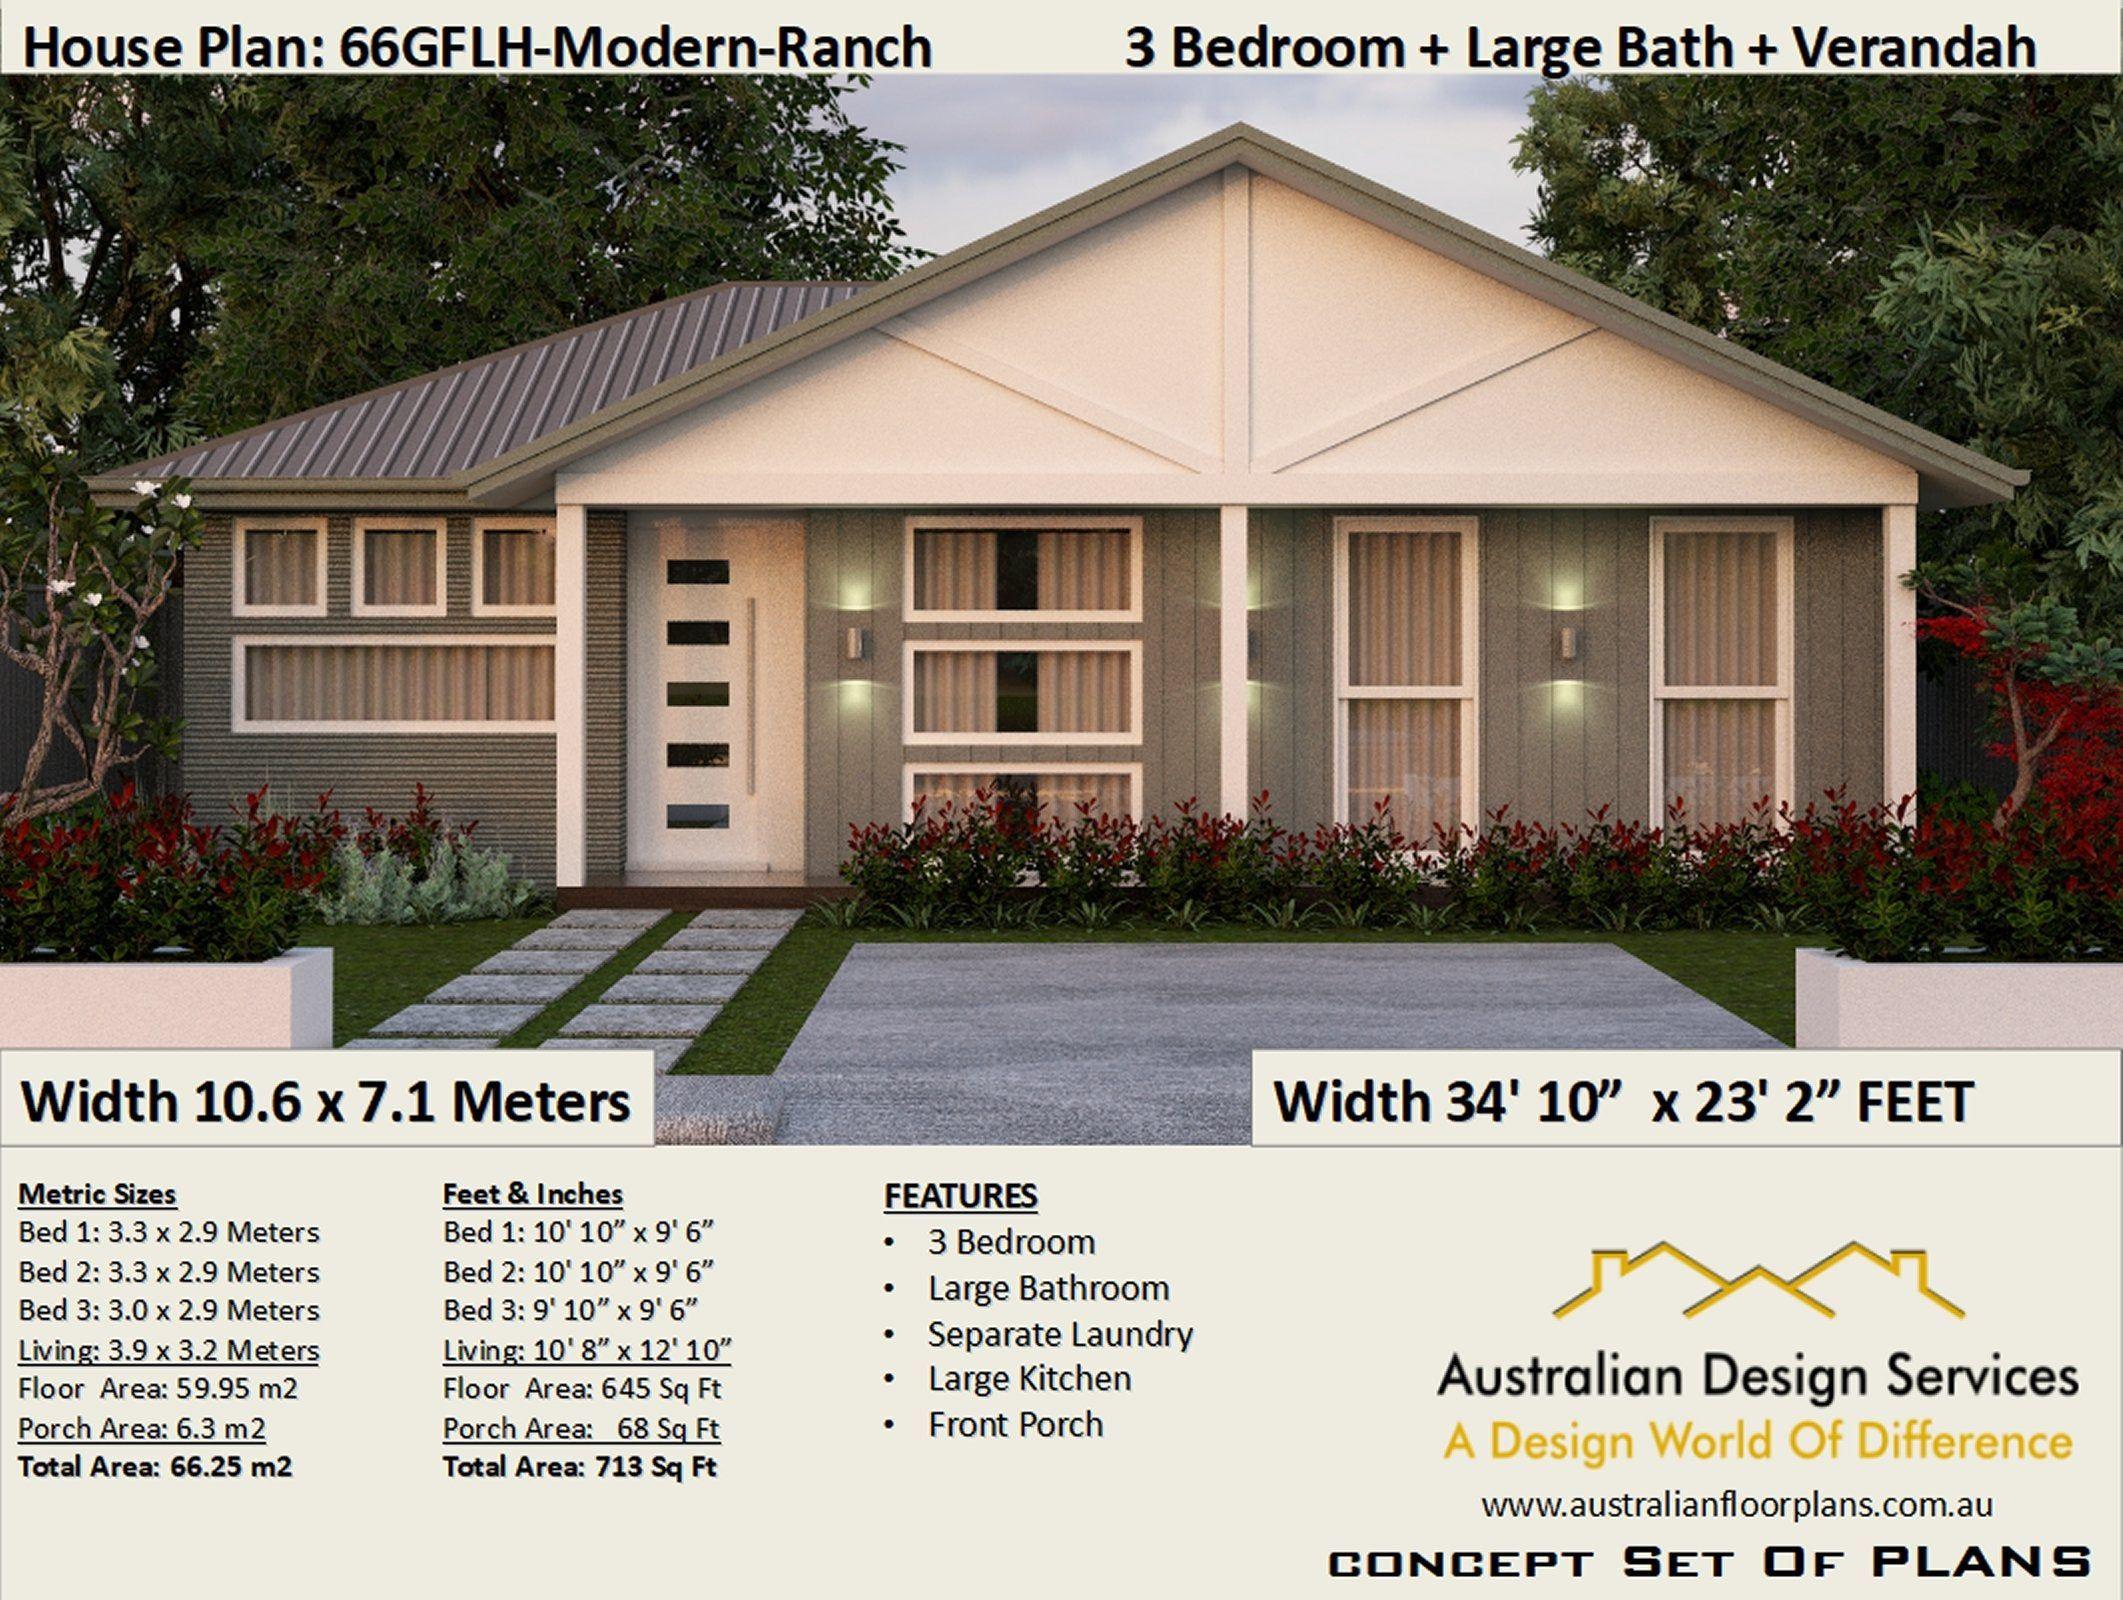 Gable Modern Ranch 3 Bedroom Home Design 66gf Modern Ranch 3 Etsy Modern Ranch House Plans Bedroom House Plans